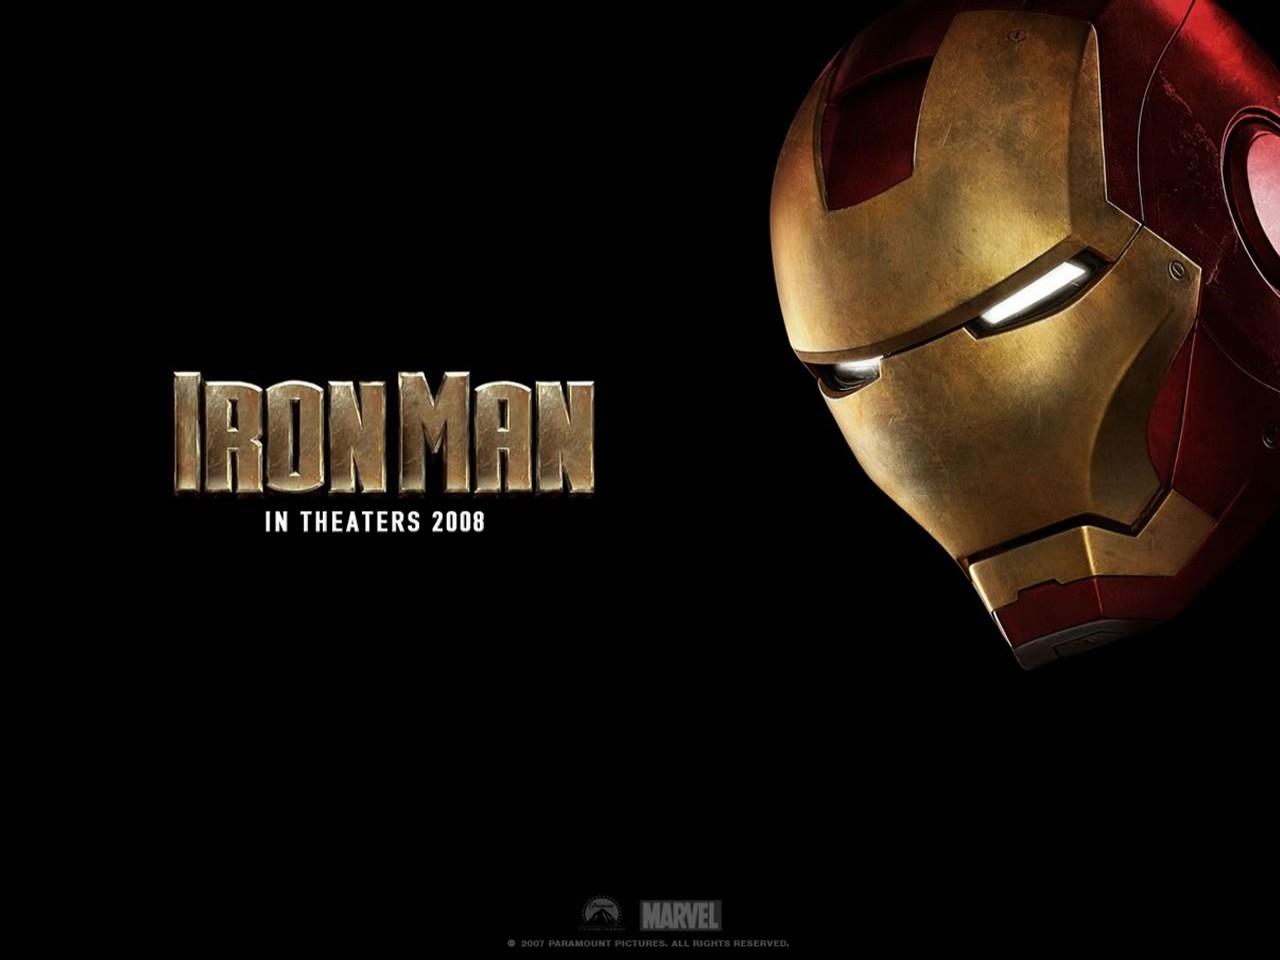 Wallpaper di Iron Man